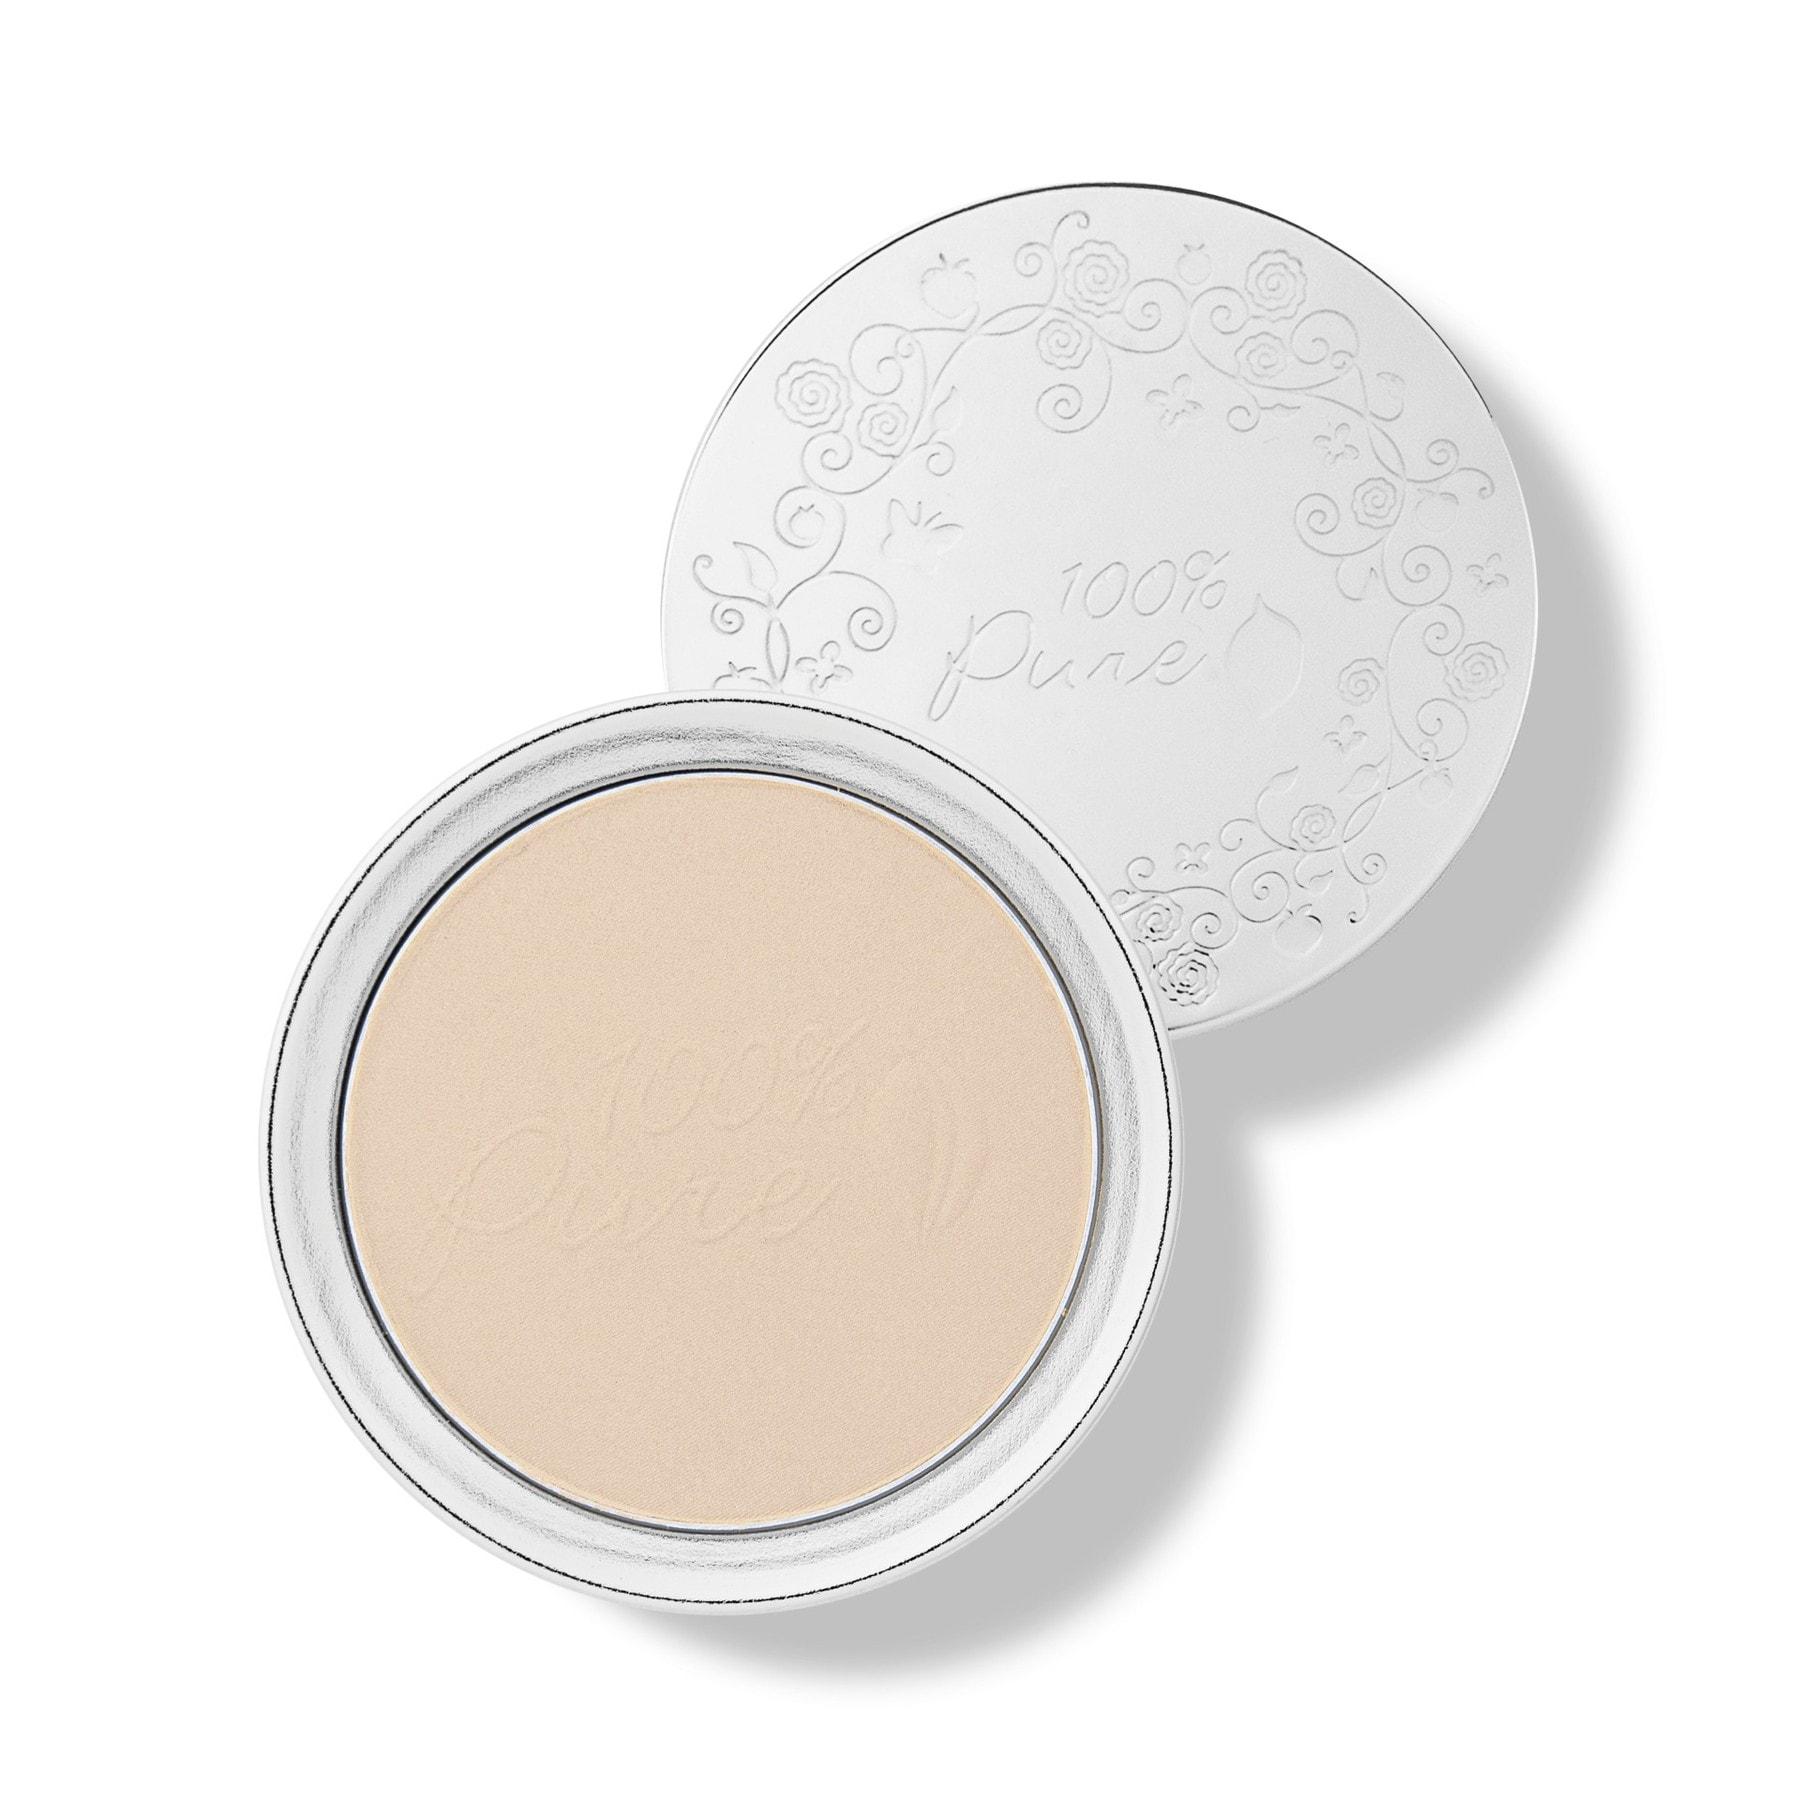 Fruit Pigmented Powder Foundation Oily Skin